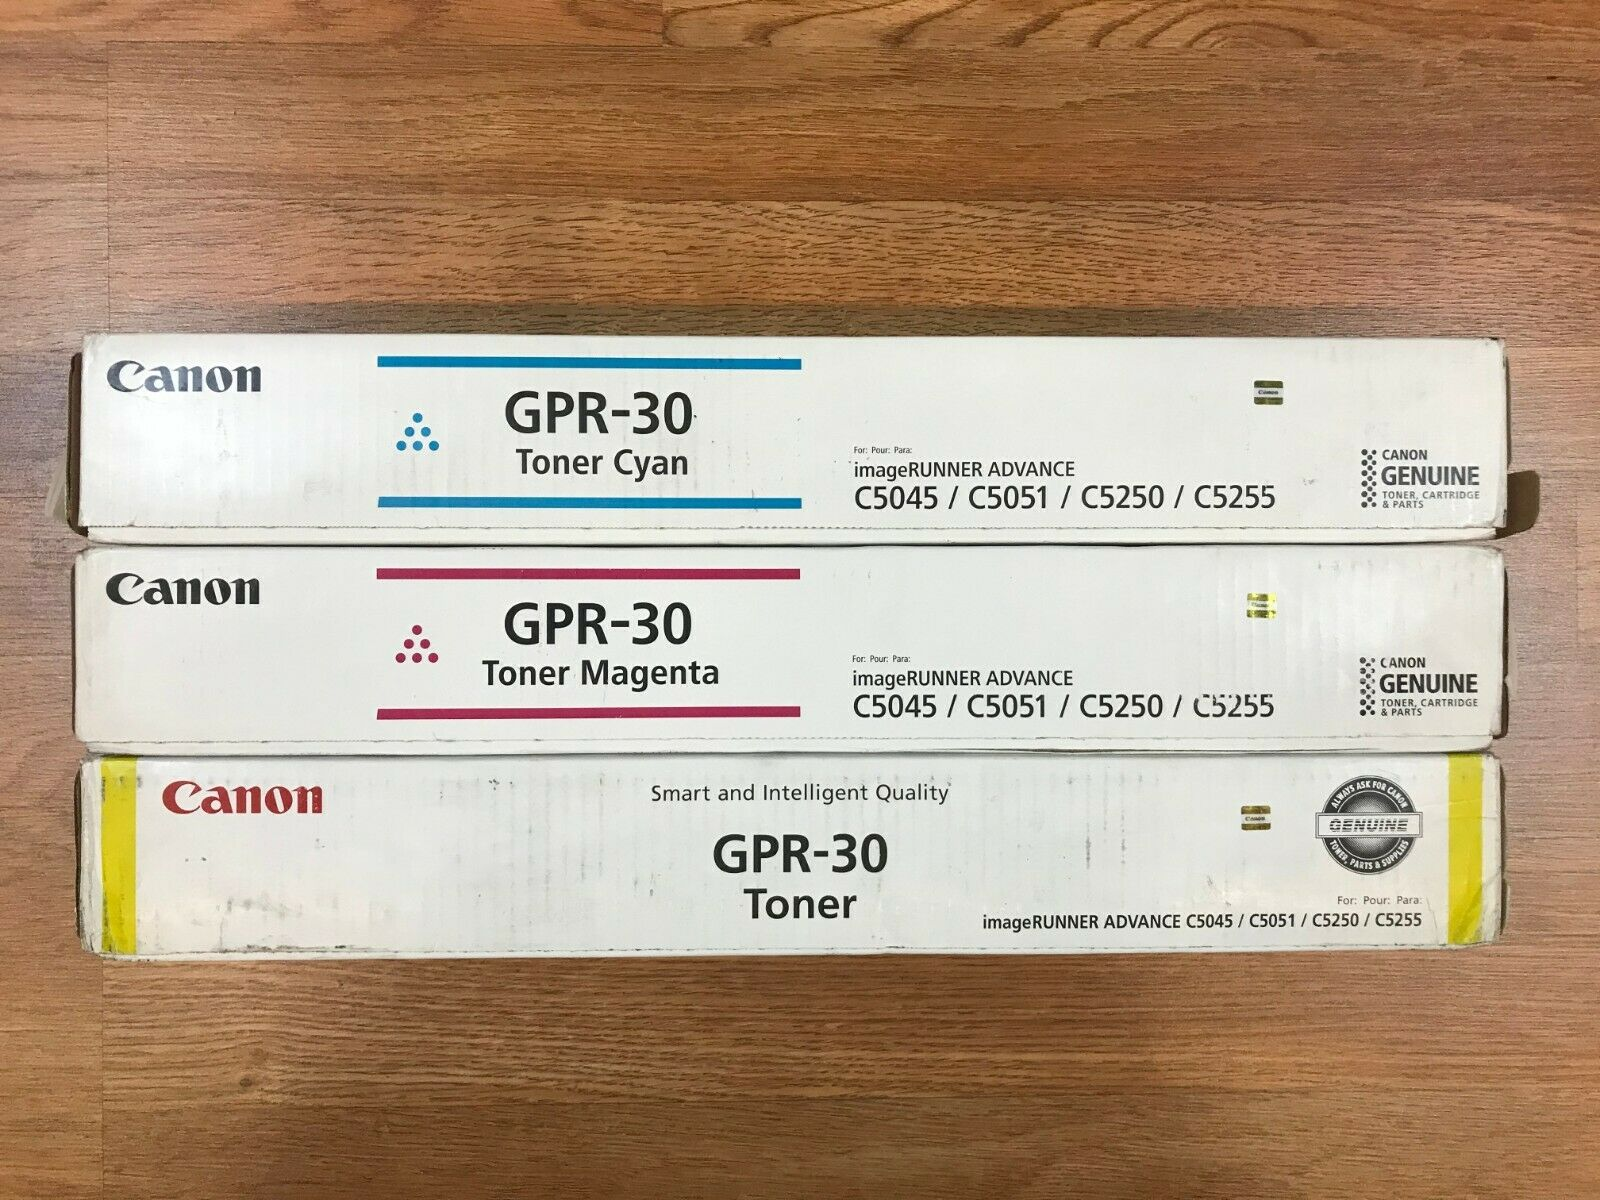 Canon GPR-30 CMY Toner For imageRUNNER ADV C5045 C5051 C5250